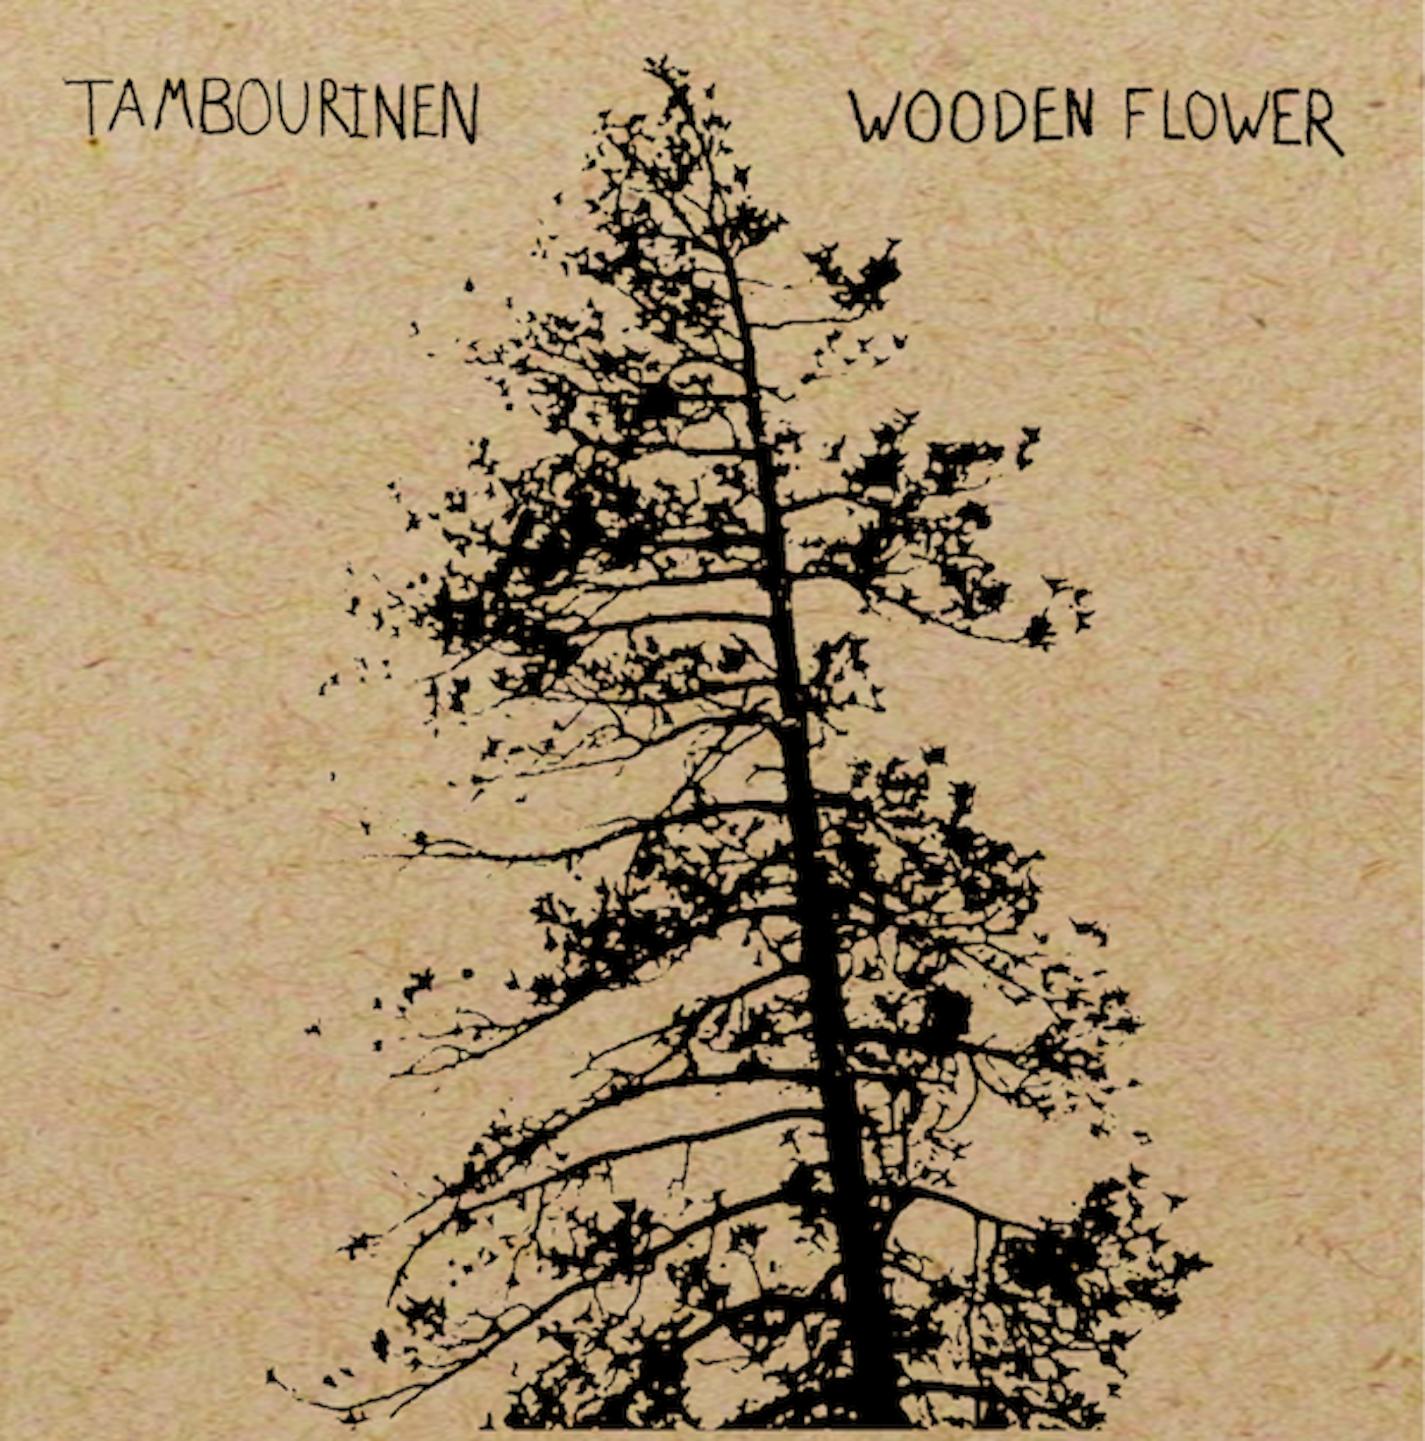 19-Tambourinen - Wooden Flower